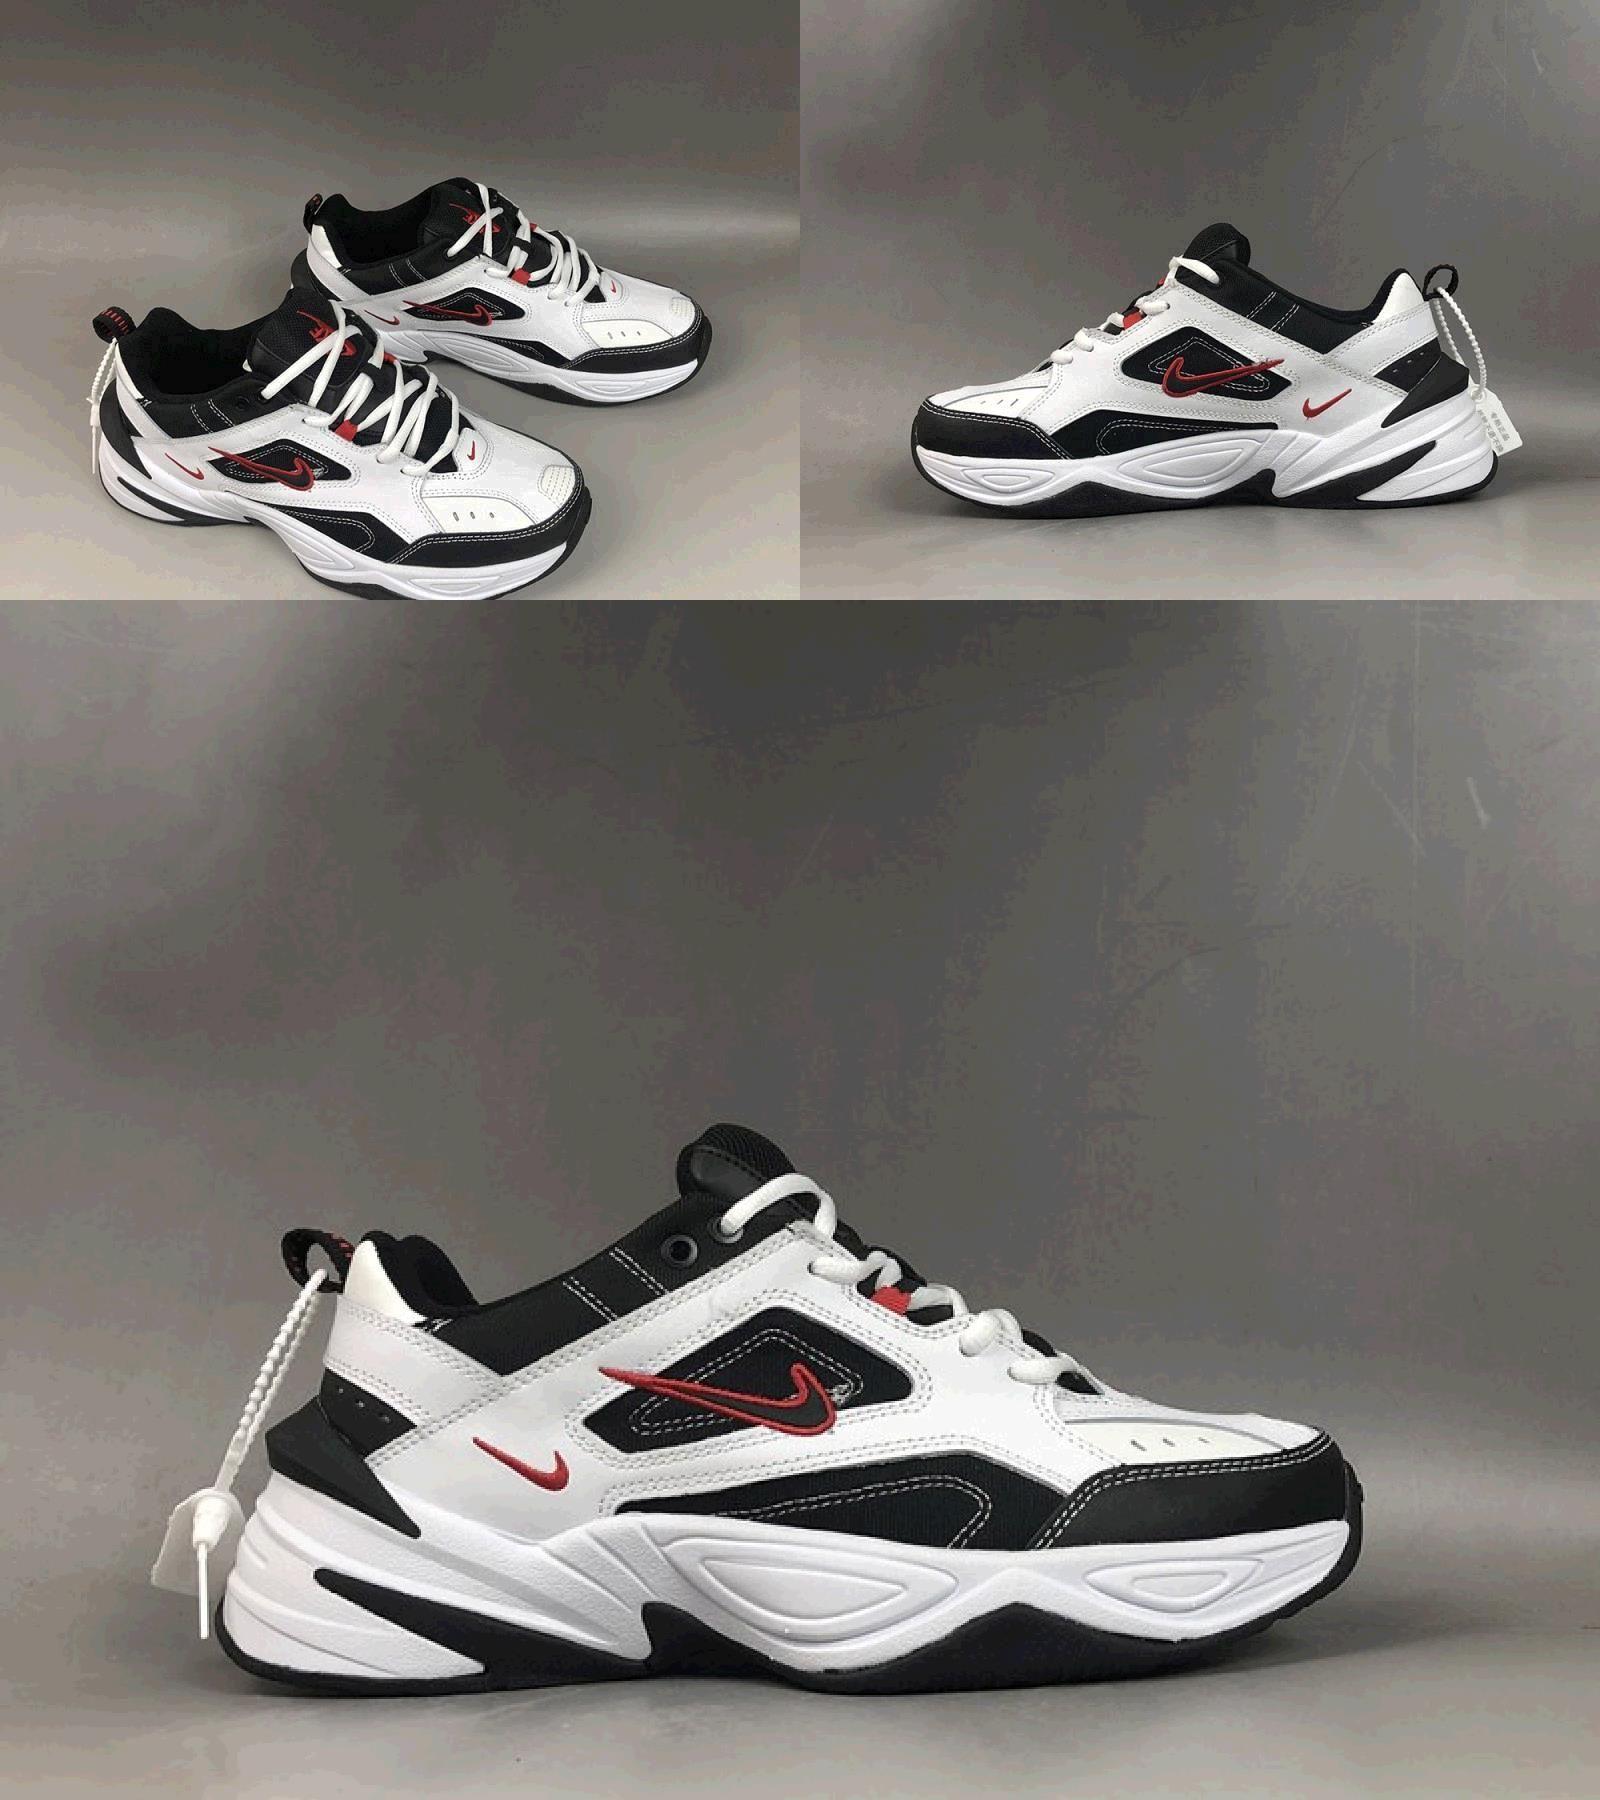 Nike M2k Tekno White Black University Red For Sale White And Black Sneakers Fashion Nike